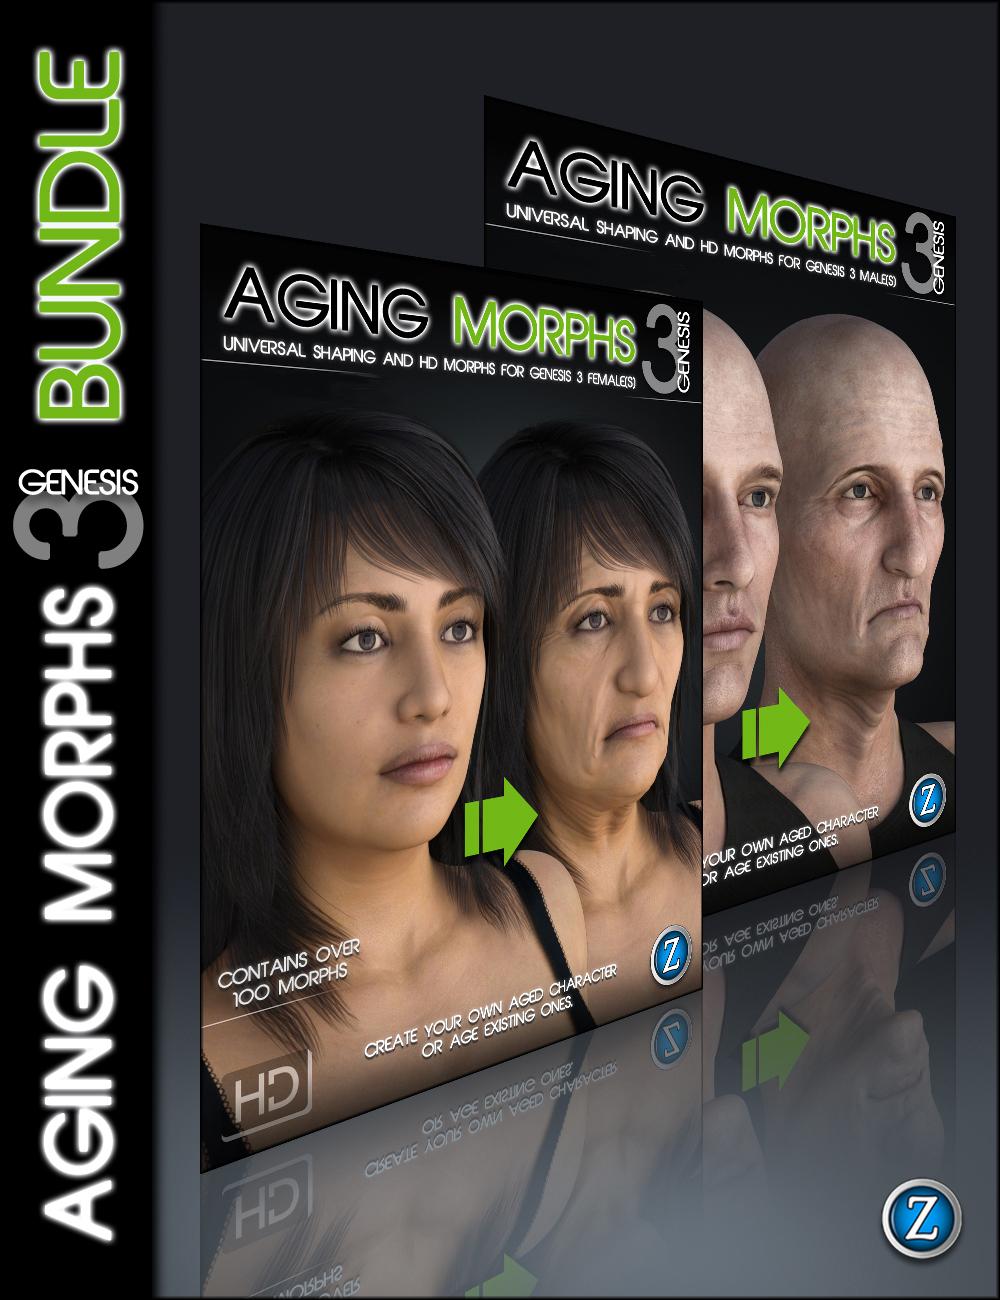 Aging Morphs 3 for Genesis 3 Bundle by: Zev0, 3D Models by Daz 3D